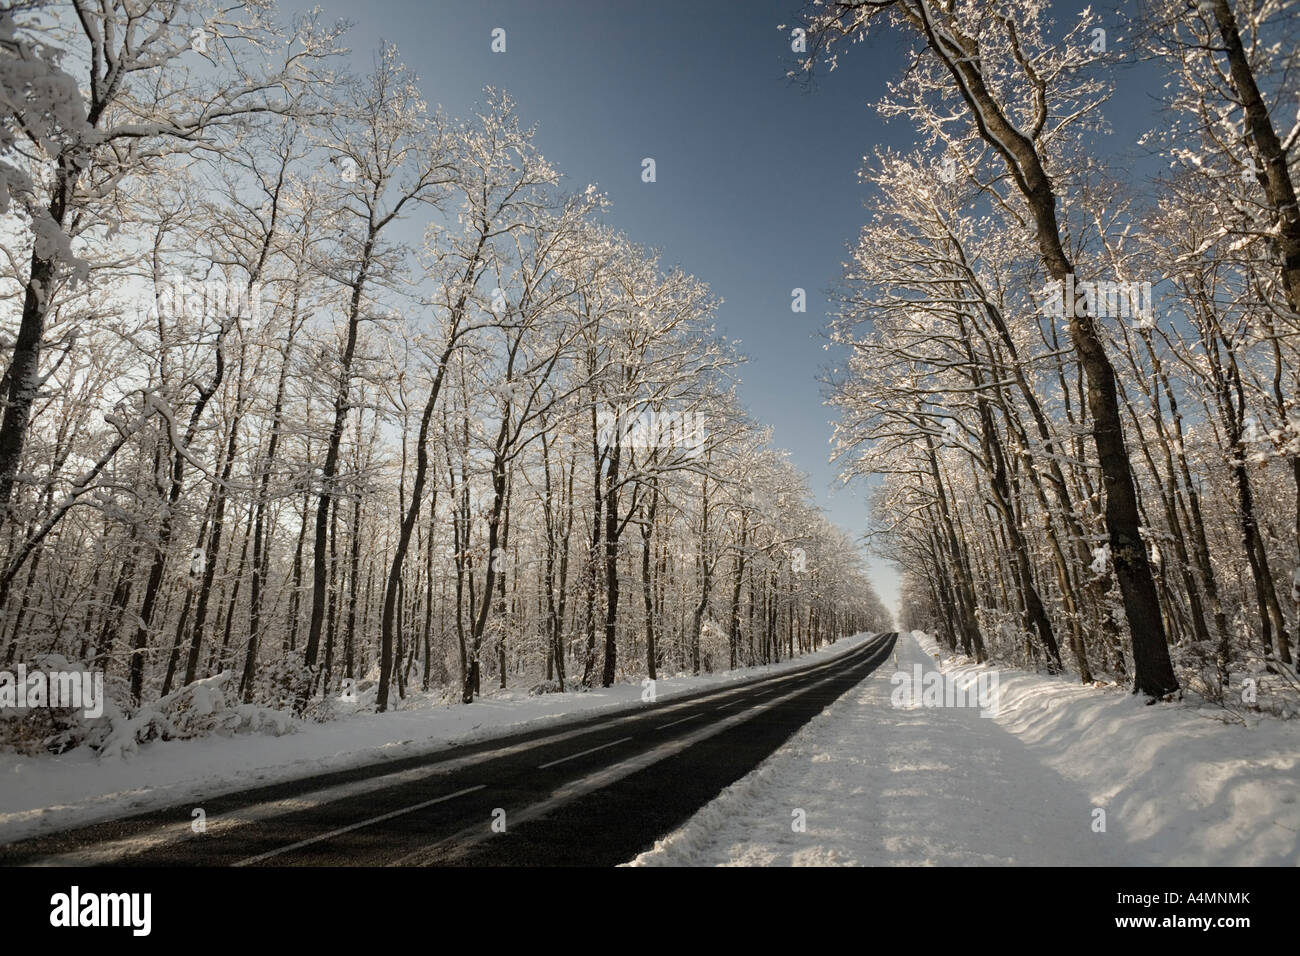 Una carretera atravesando un bosque de roble nevado (Francia). Ruta une forêt de chênes traversant (Quercus sp) recouverte de neige. Foto de stock